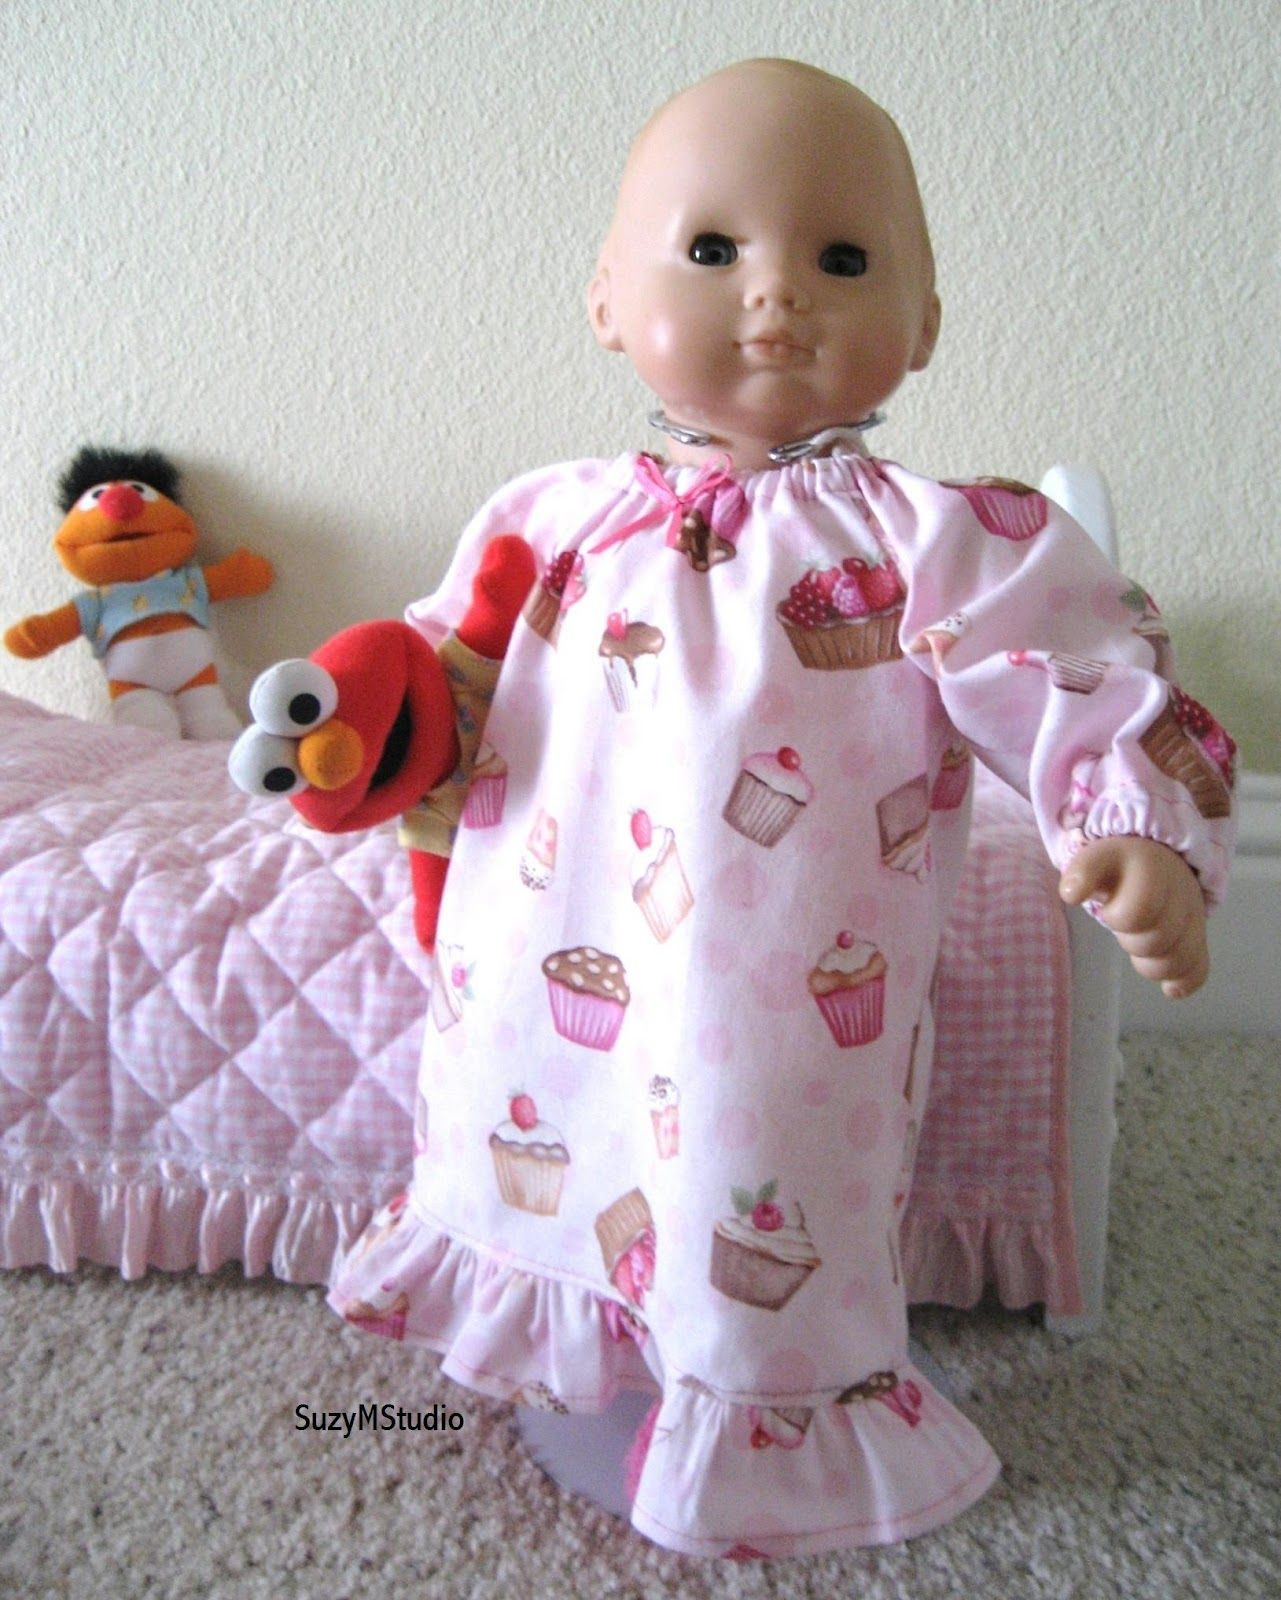 SuzyMStudio Bitty Baby Bitty Baby Pinterest